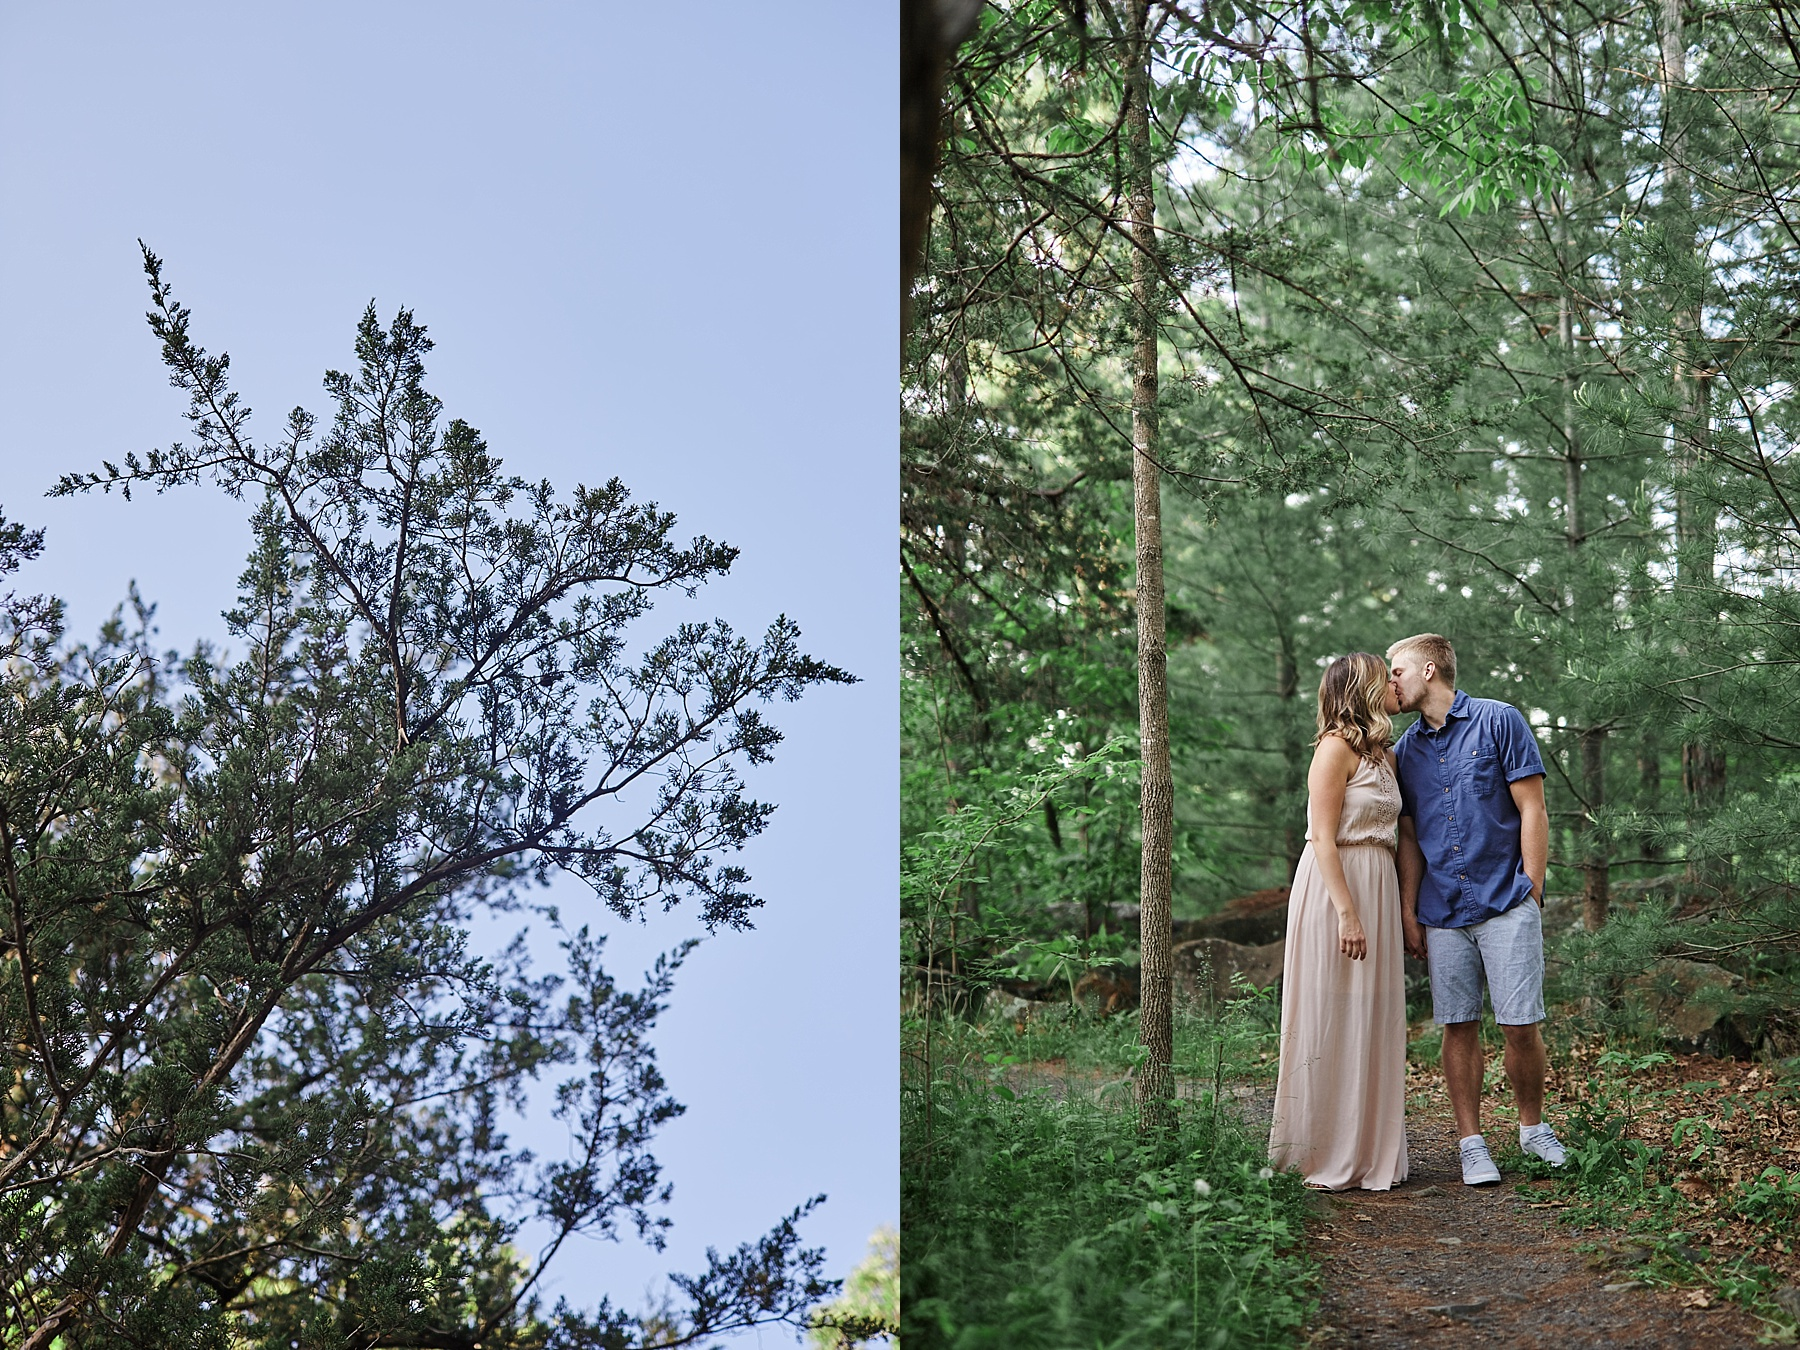 Destination-Engagement-Taylors-Falls-Minnesota-Minneapolis-Mayowood-Stone-Barn_0061.jpg